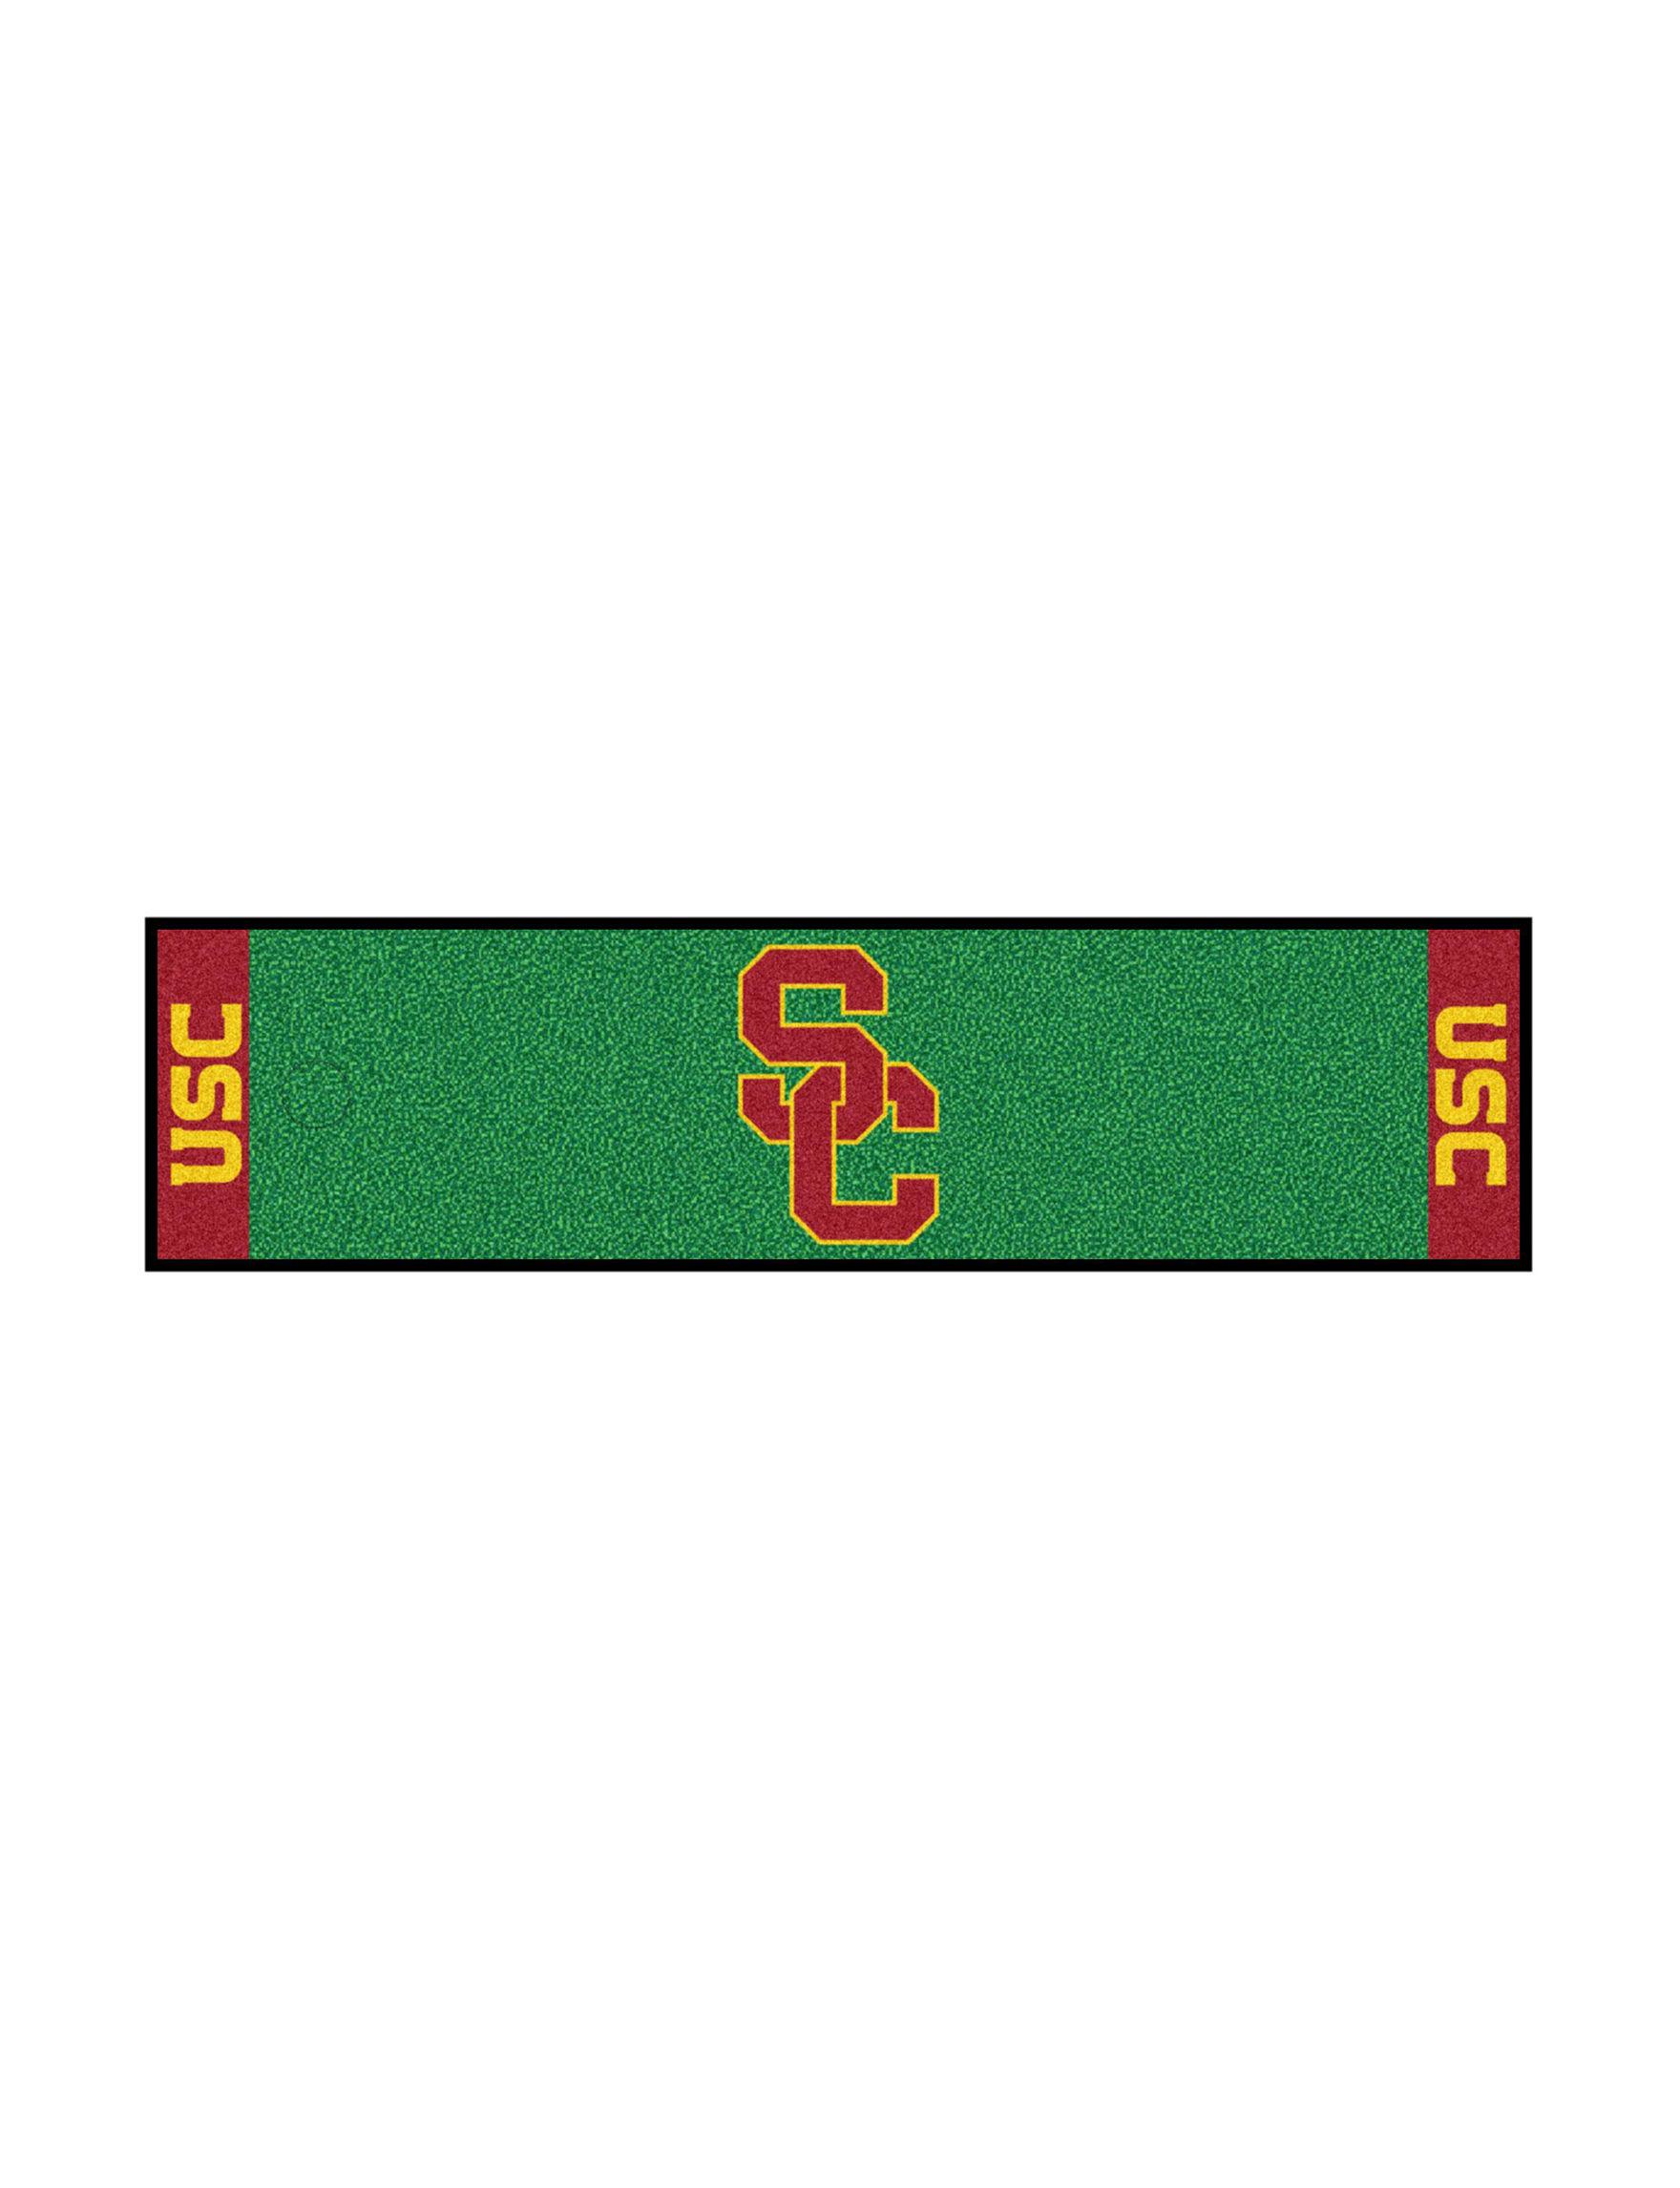 Fanmats Red / Yellow Outdoor Rugs & Doormats Outdoor Decor